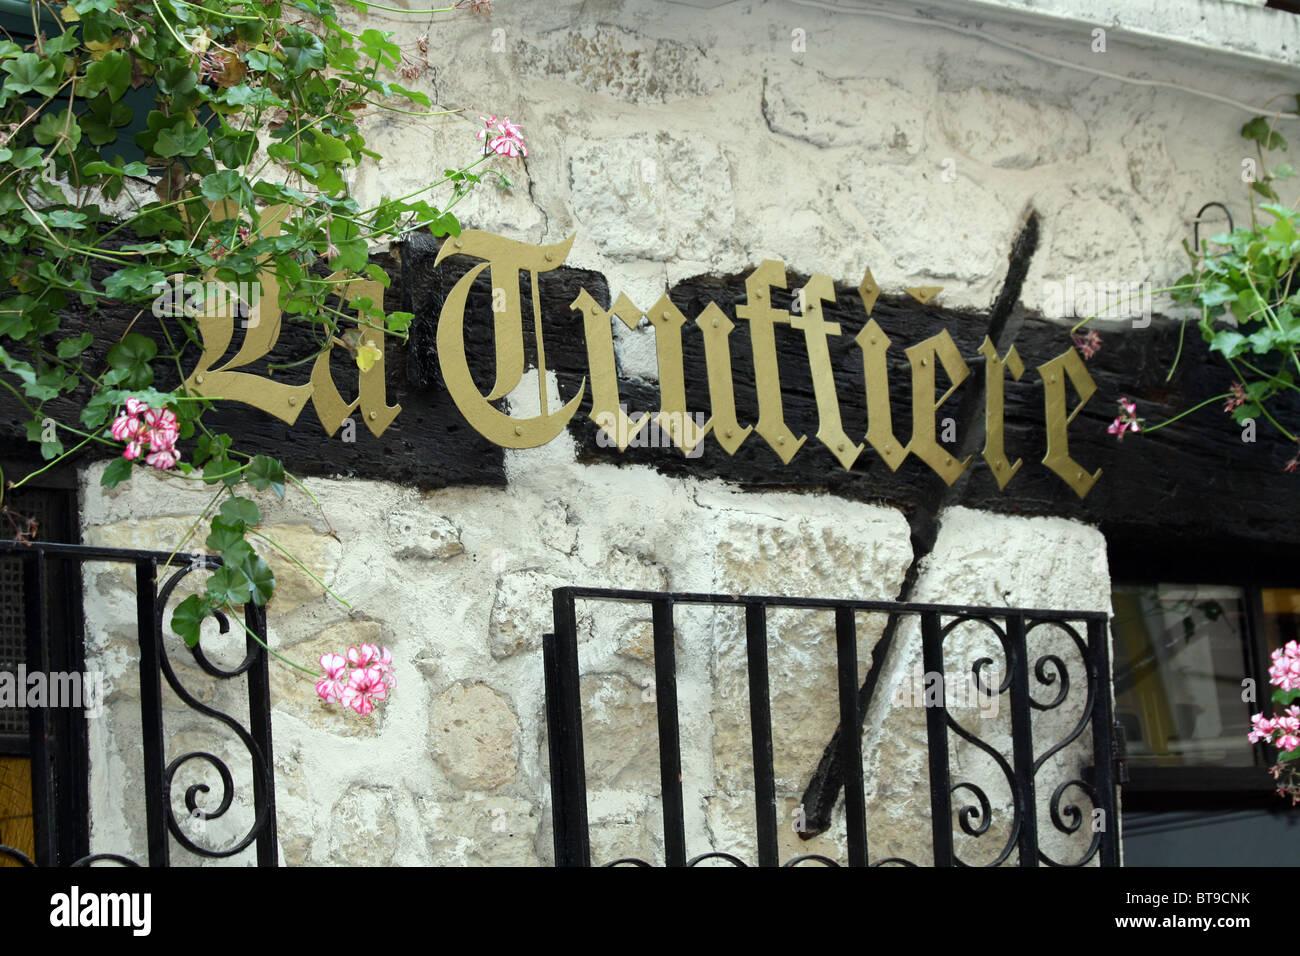 La Truffiere restuarant in Paris, France - Stock Image